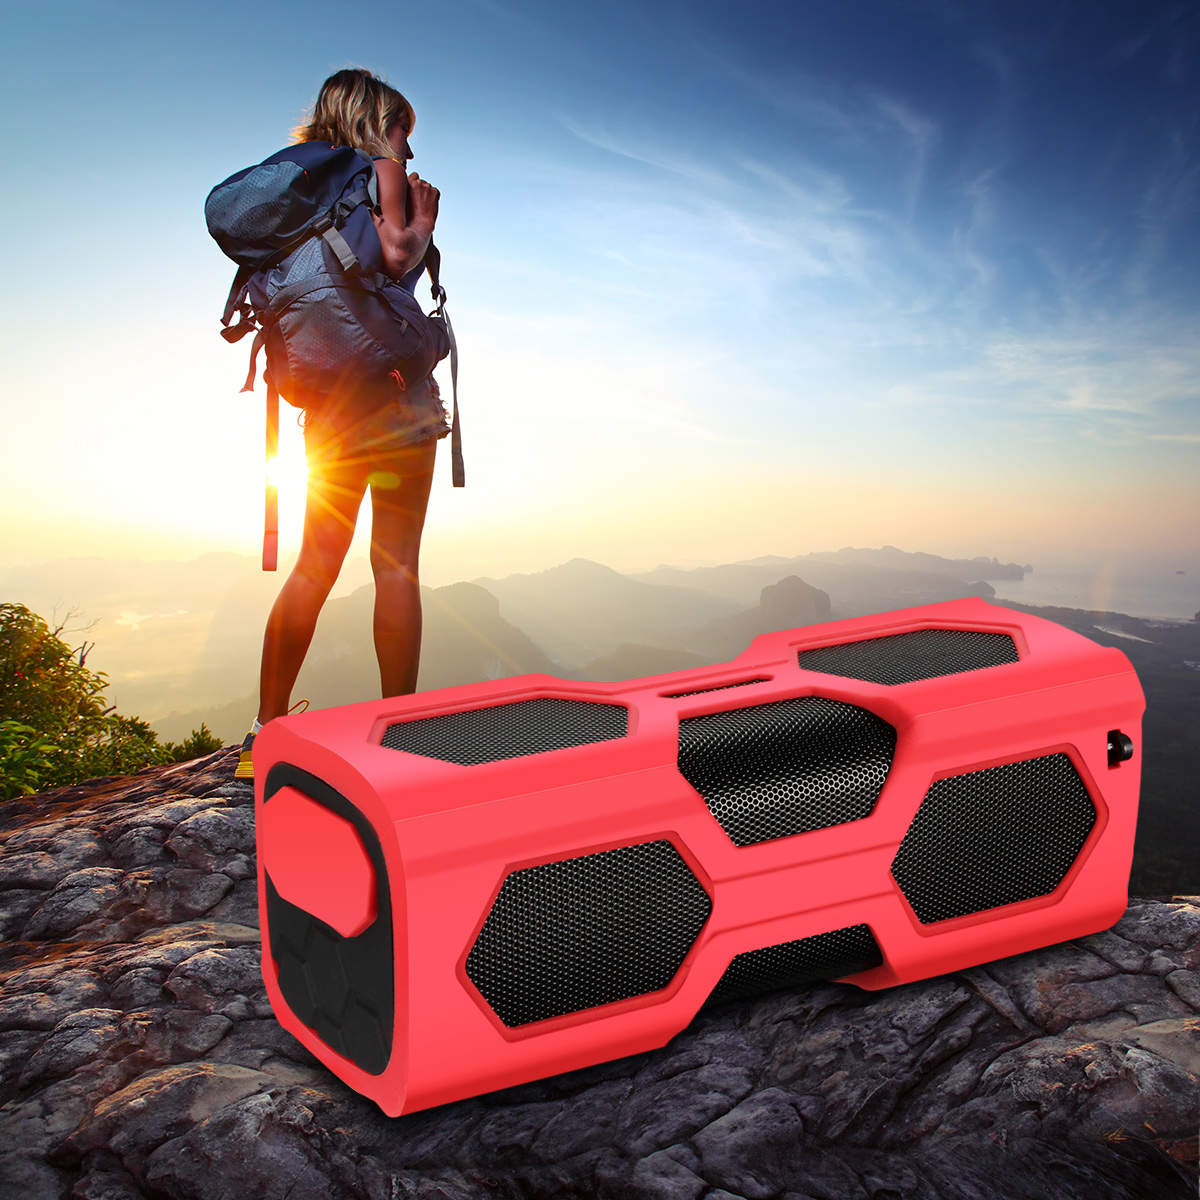 3600mAh Wireless Bluetooth 4.0 Waterproof Speaker Power Bank Shockproof Portable Speaker Super Bass Built-in Mic NFC with Metal Hook for Smartphones Outdoor